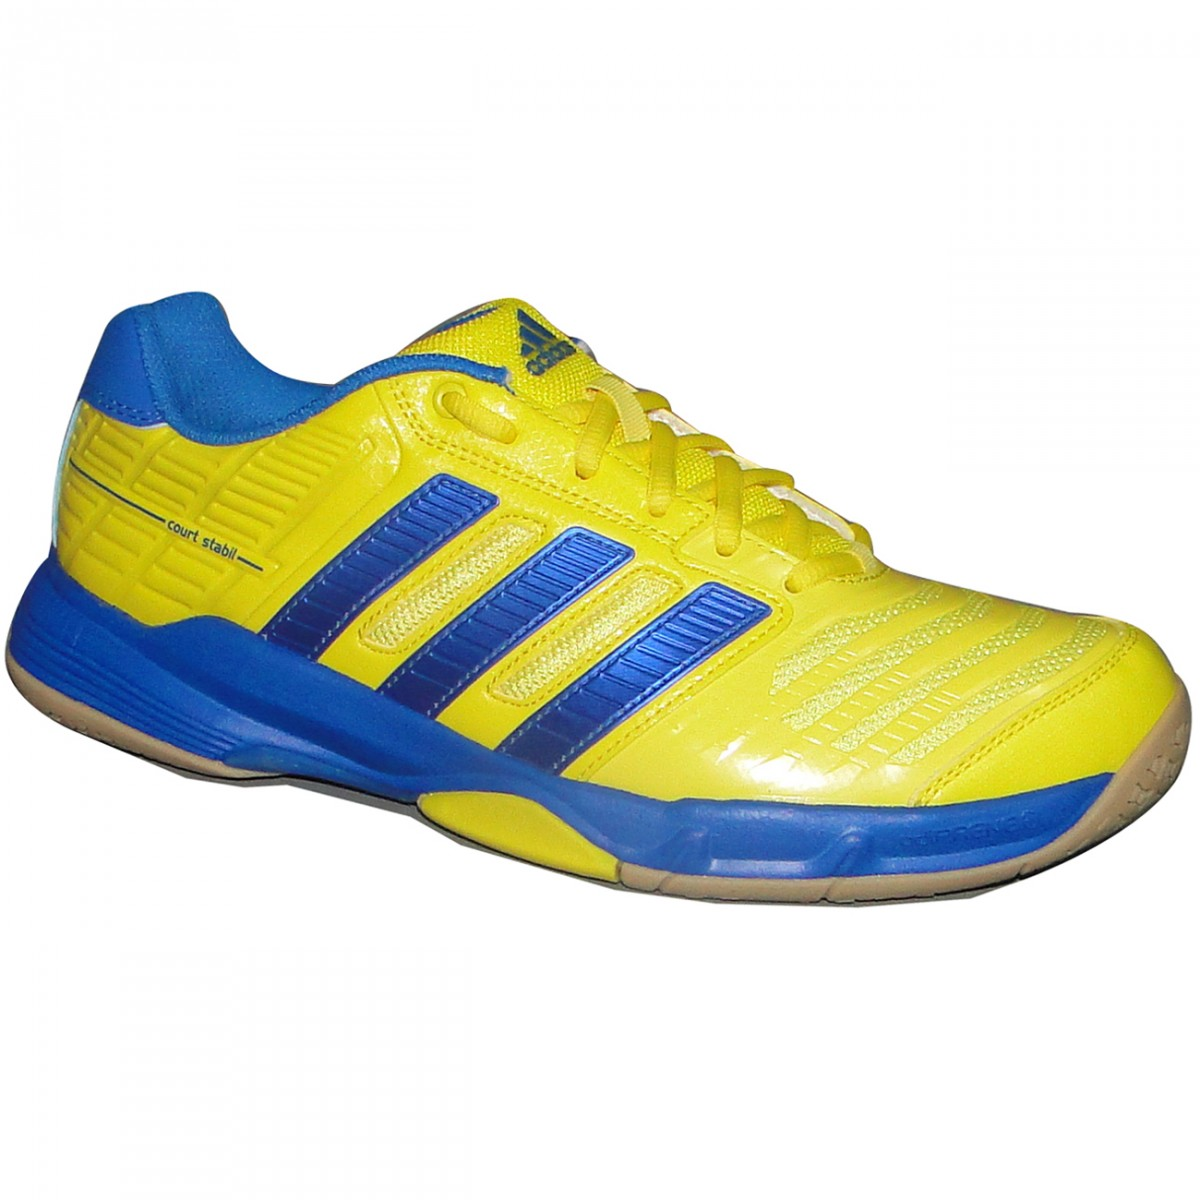 Tenis Adidas Court Stabil 10 G64995 - Amarelo Azul - Chuteira Nike ... 0ca69e4b74a